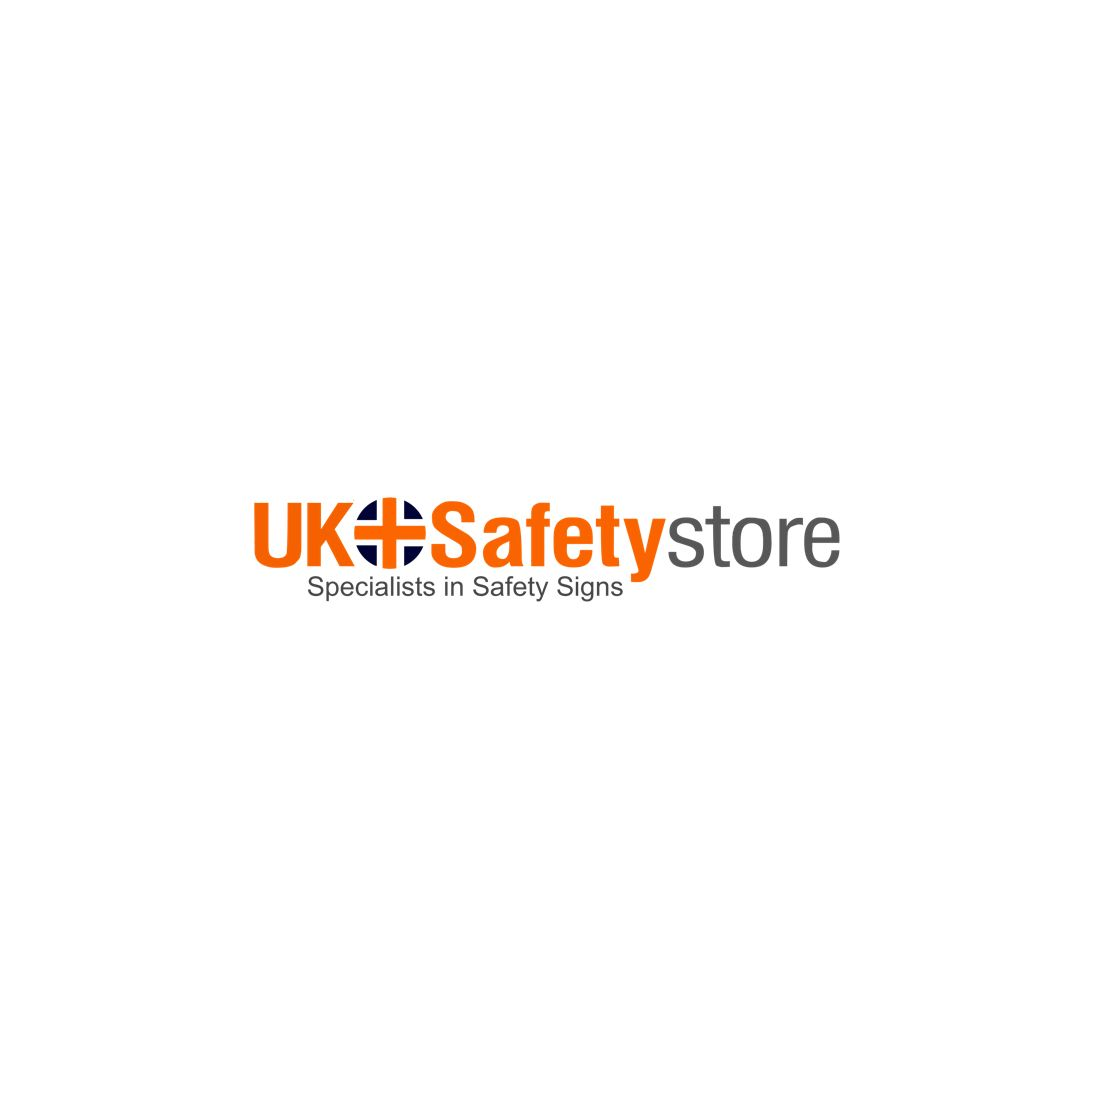 Safety Helmets Must Be Worn 600mm x 200mm - Rigid Plastic